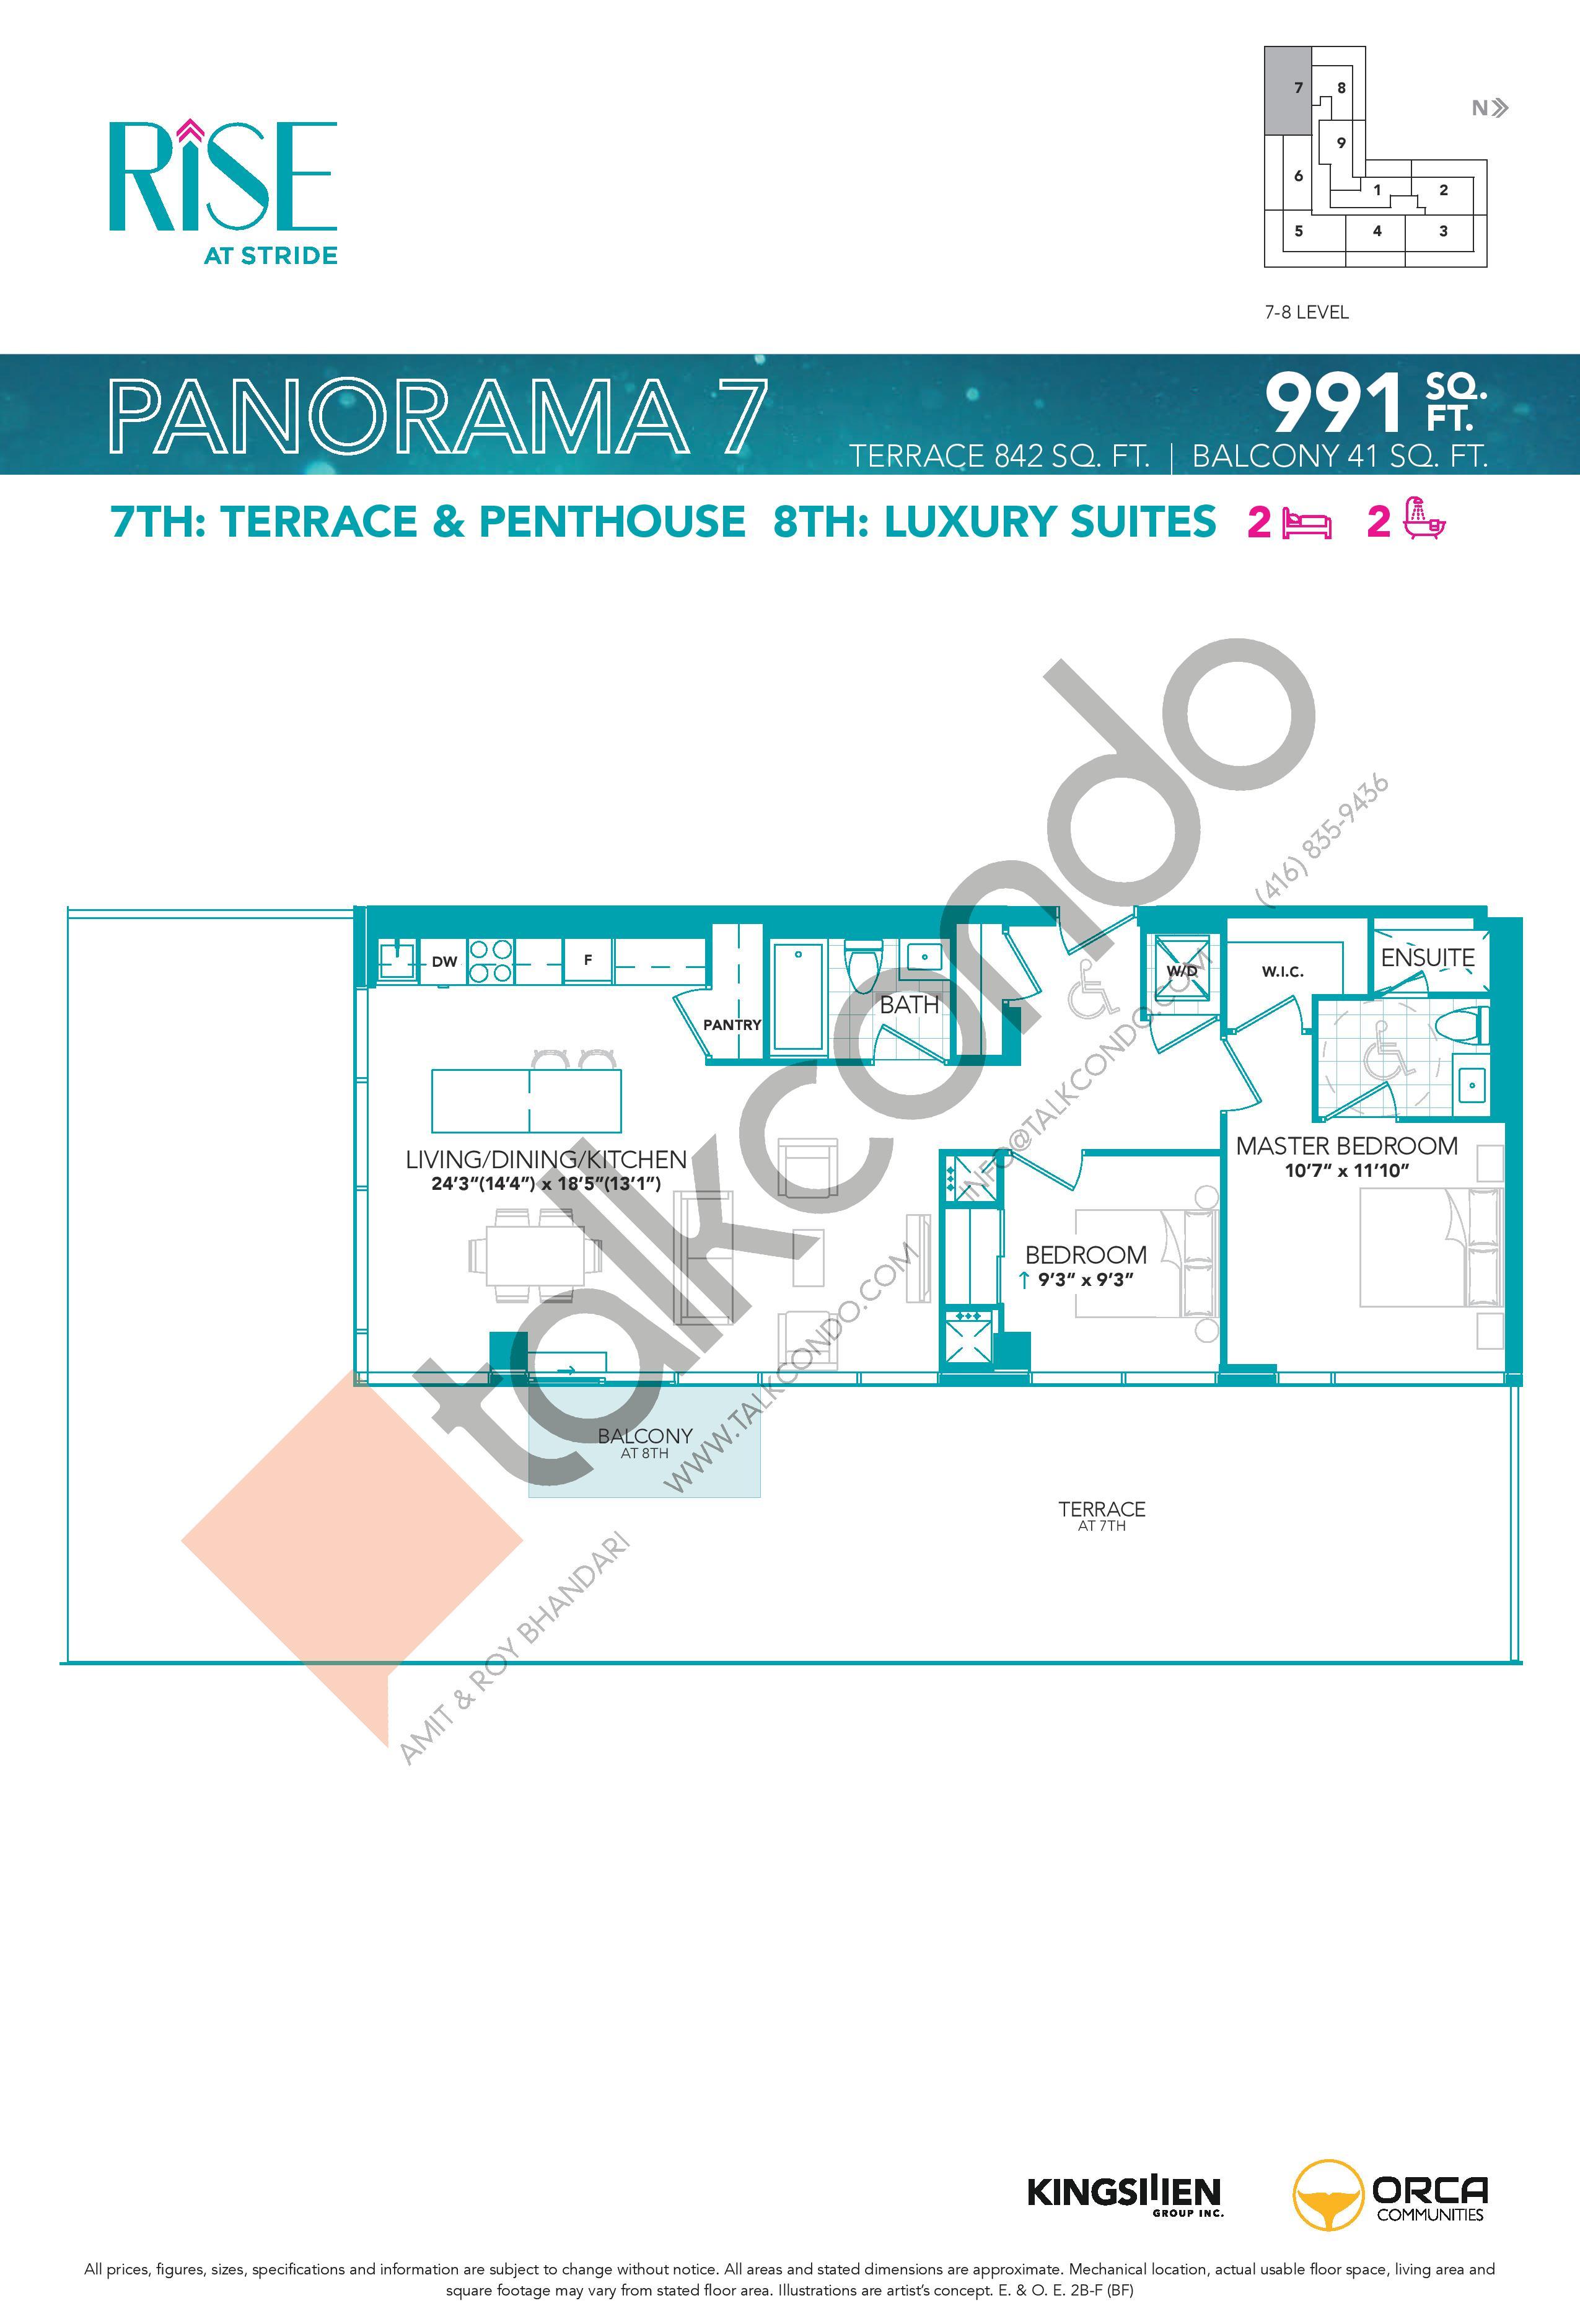 Panorama 7 Floor Plan at Rise at Stride Condos - 991 sq.ft